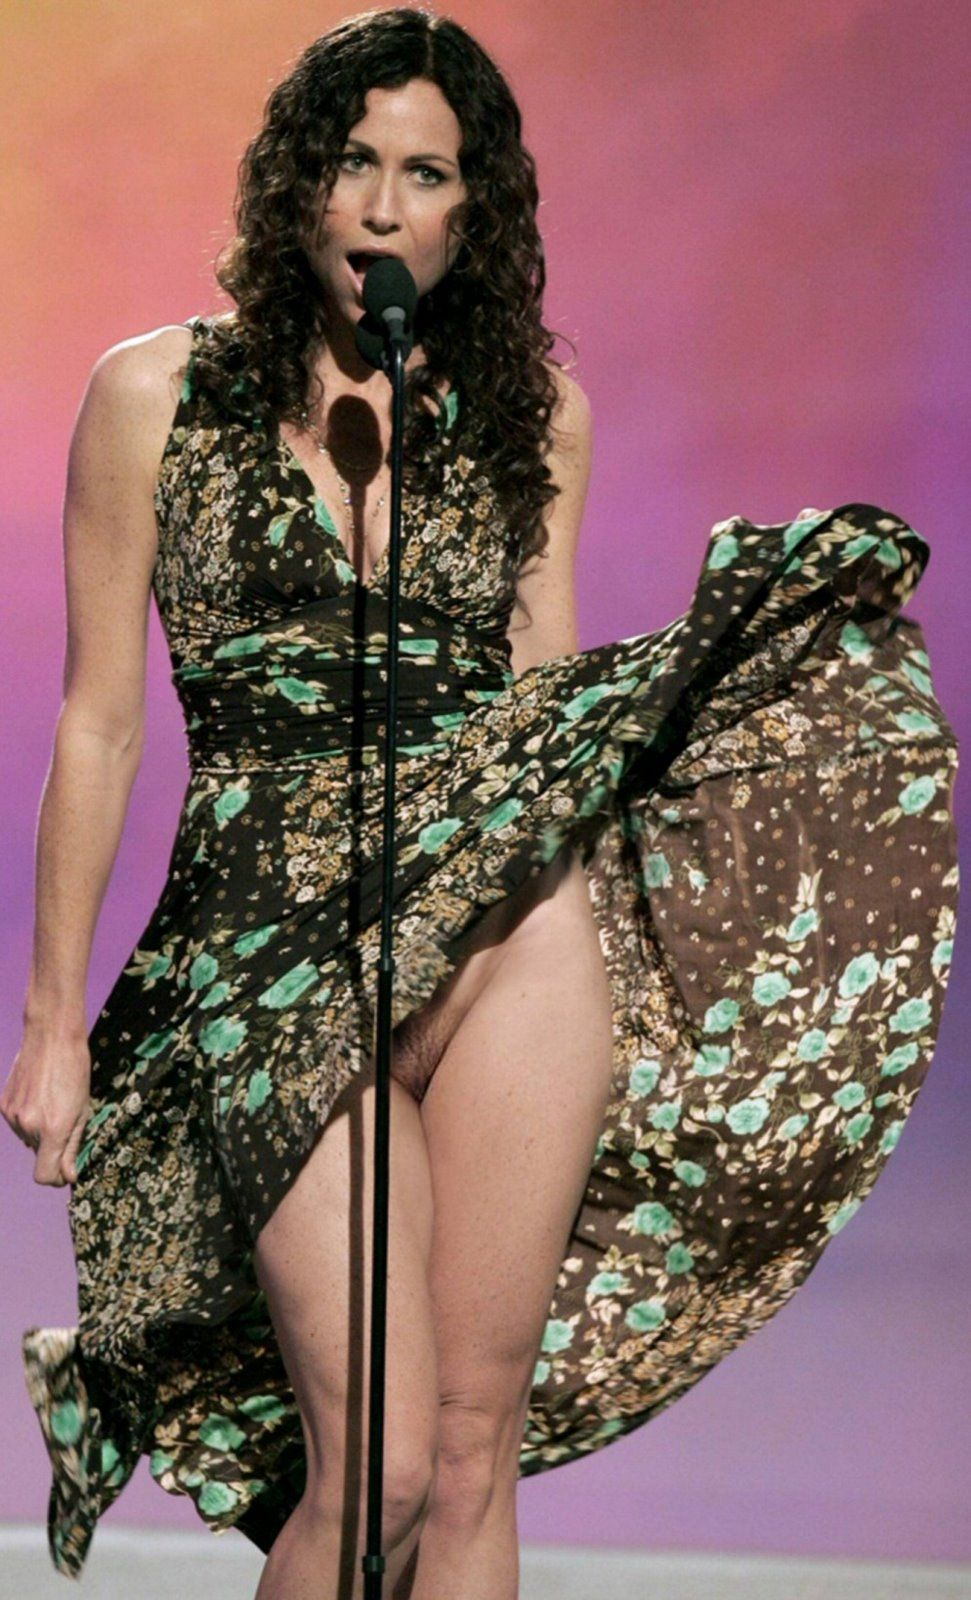 Naked celebrity voyeur